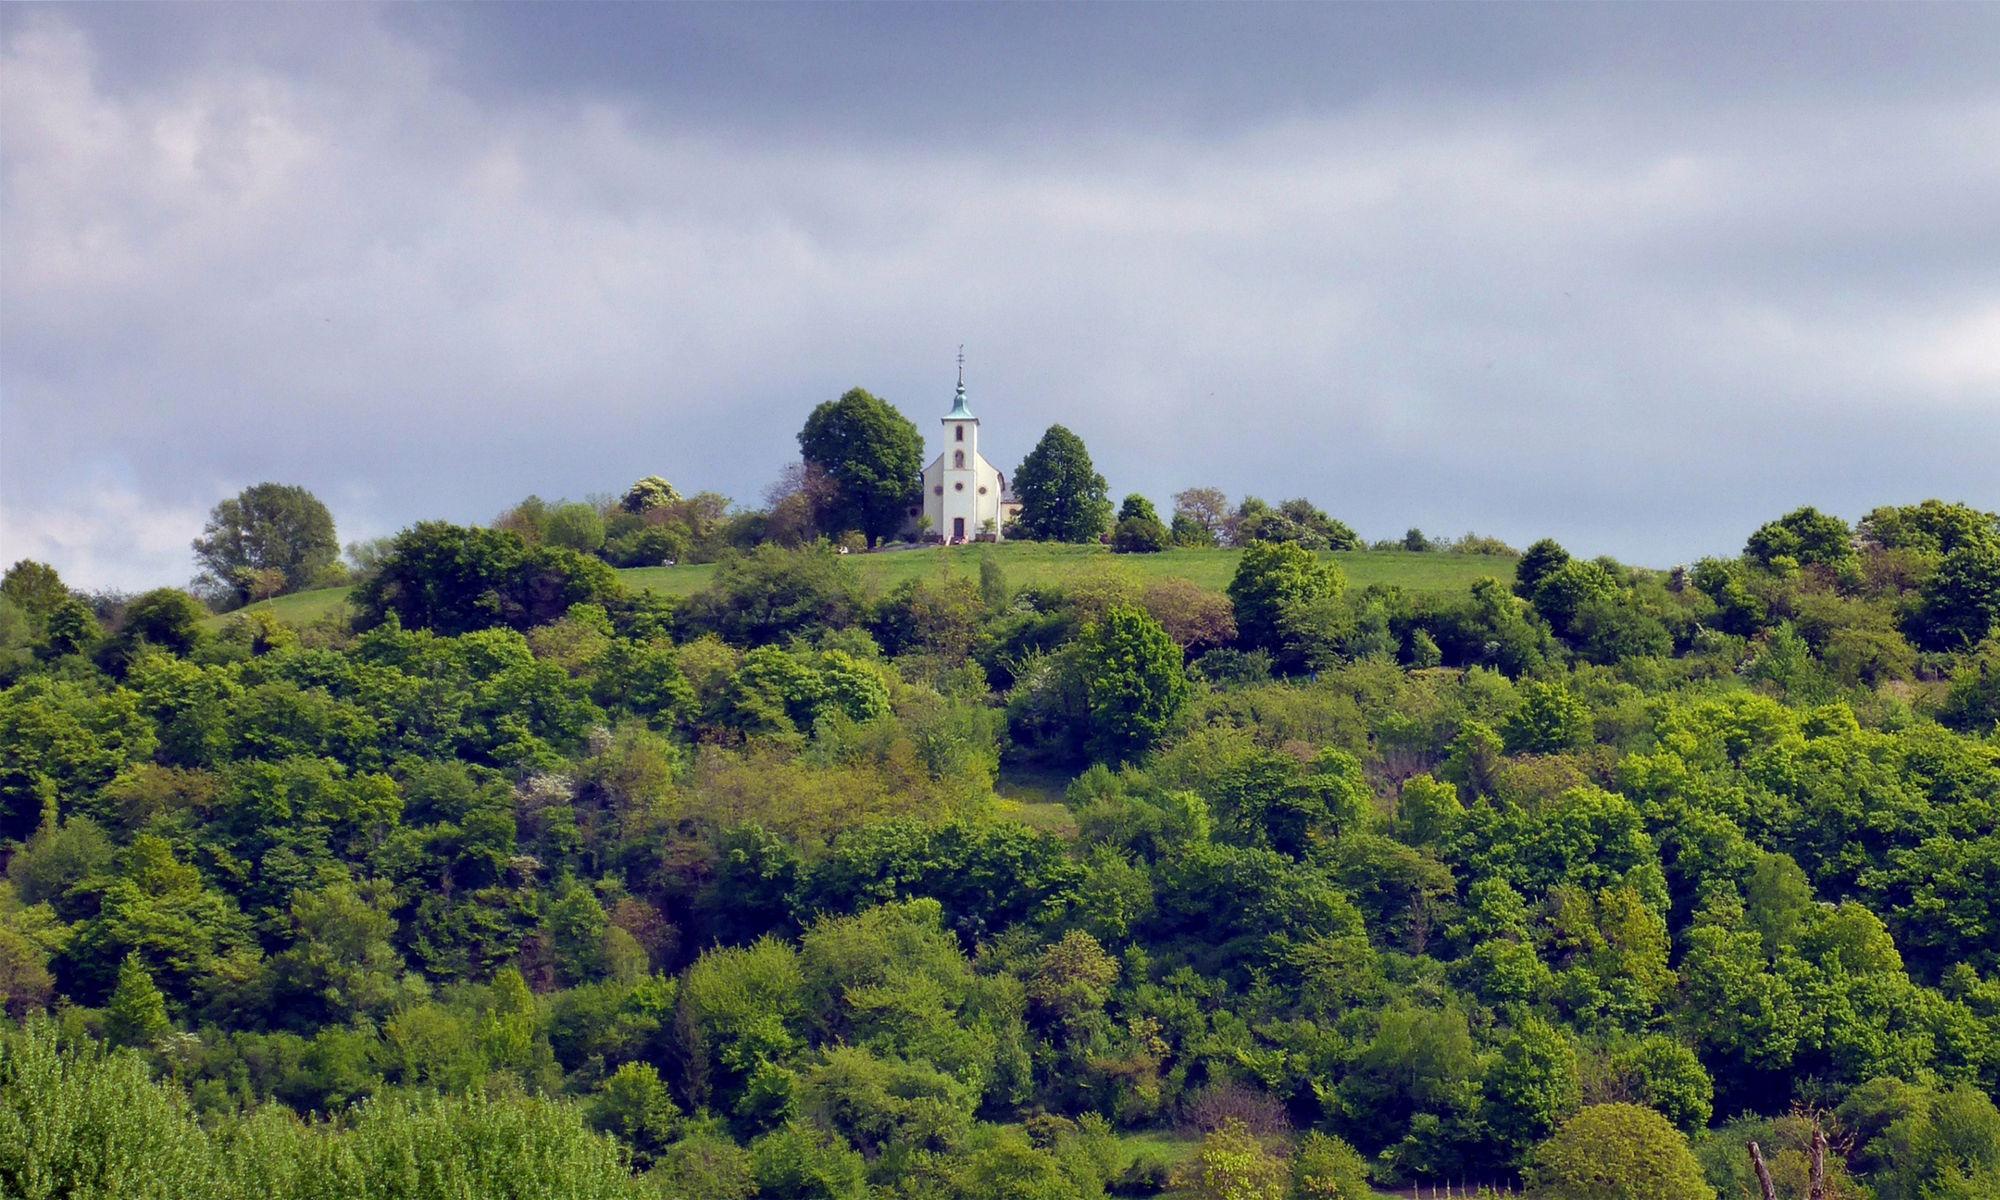 Gegenwind Obergrombach-Helmsheim-Kraichgau e.V.